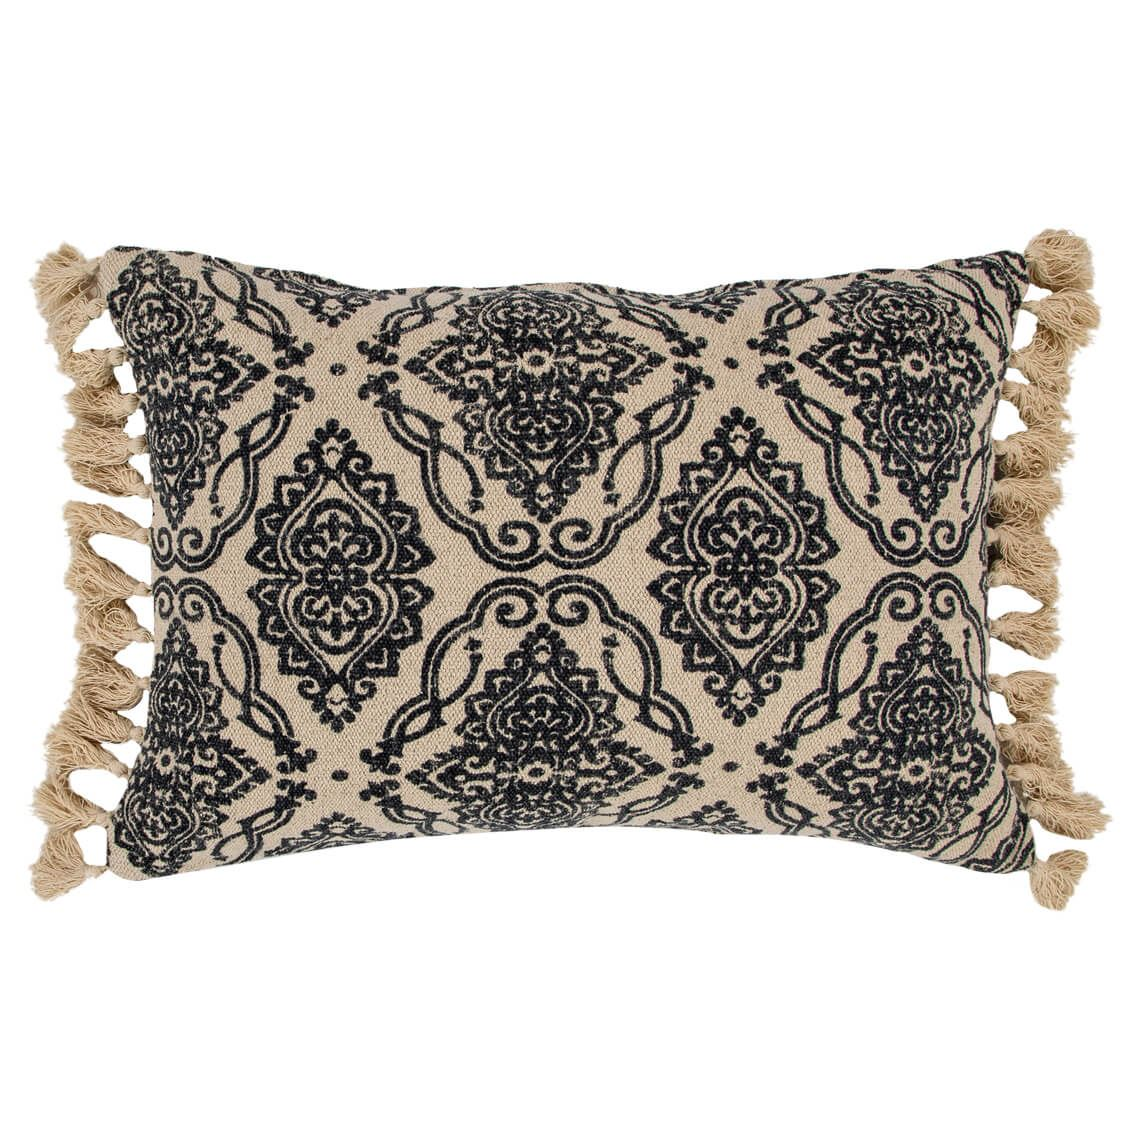 Sessa Cushion Size W 40cm x D 15cm x H 60cm in Blue Freedom